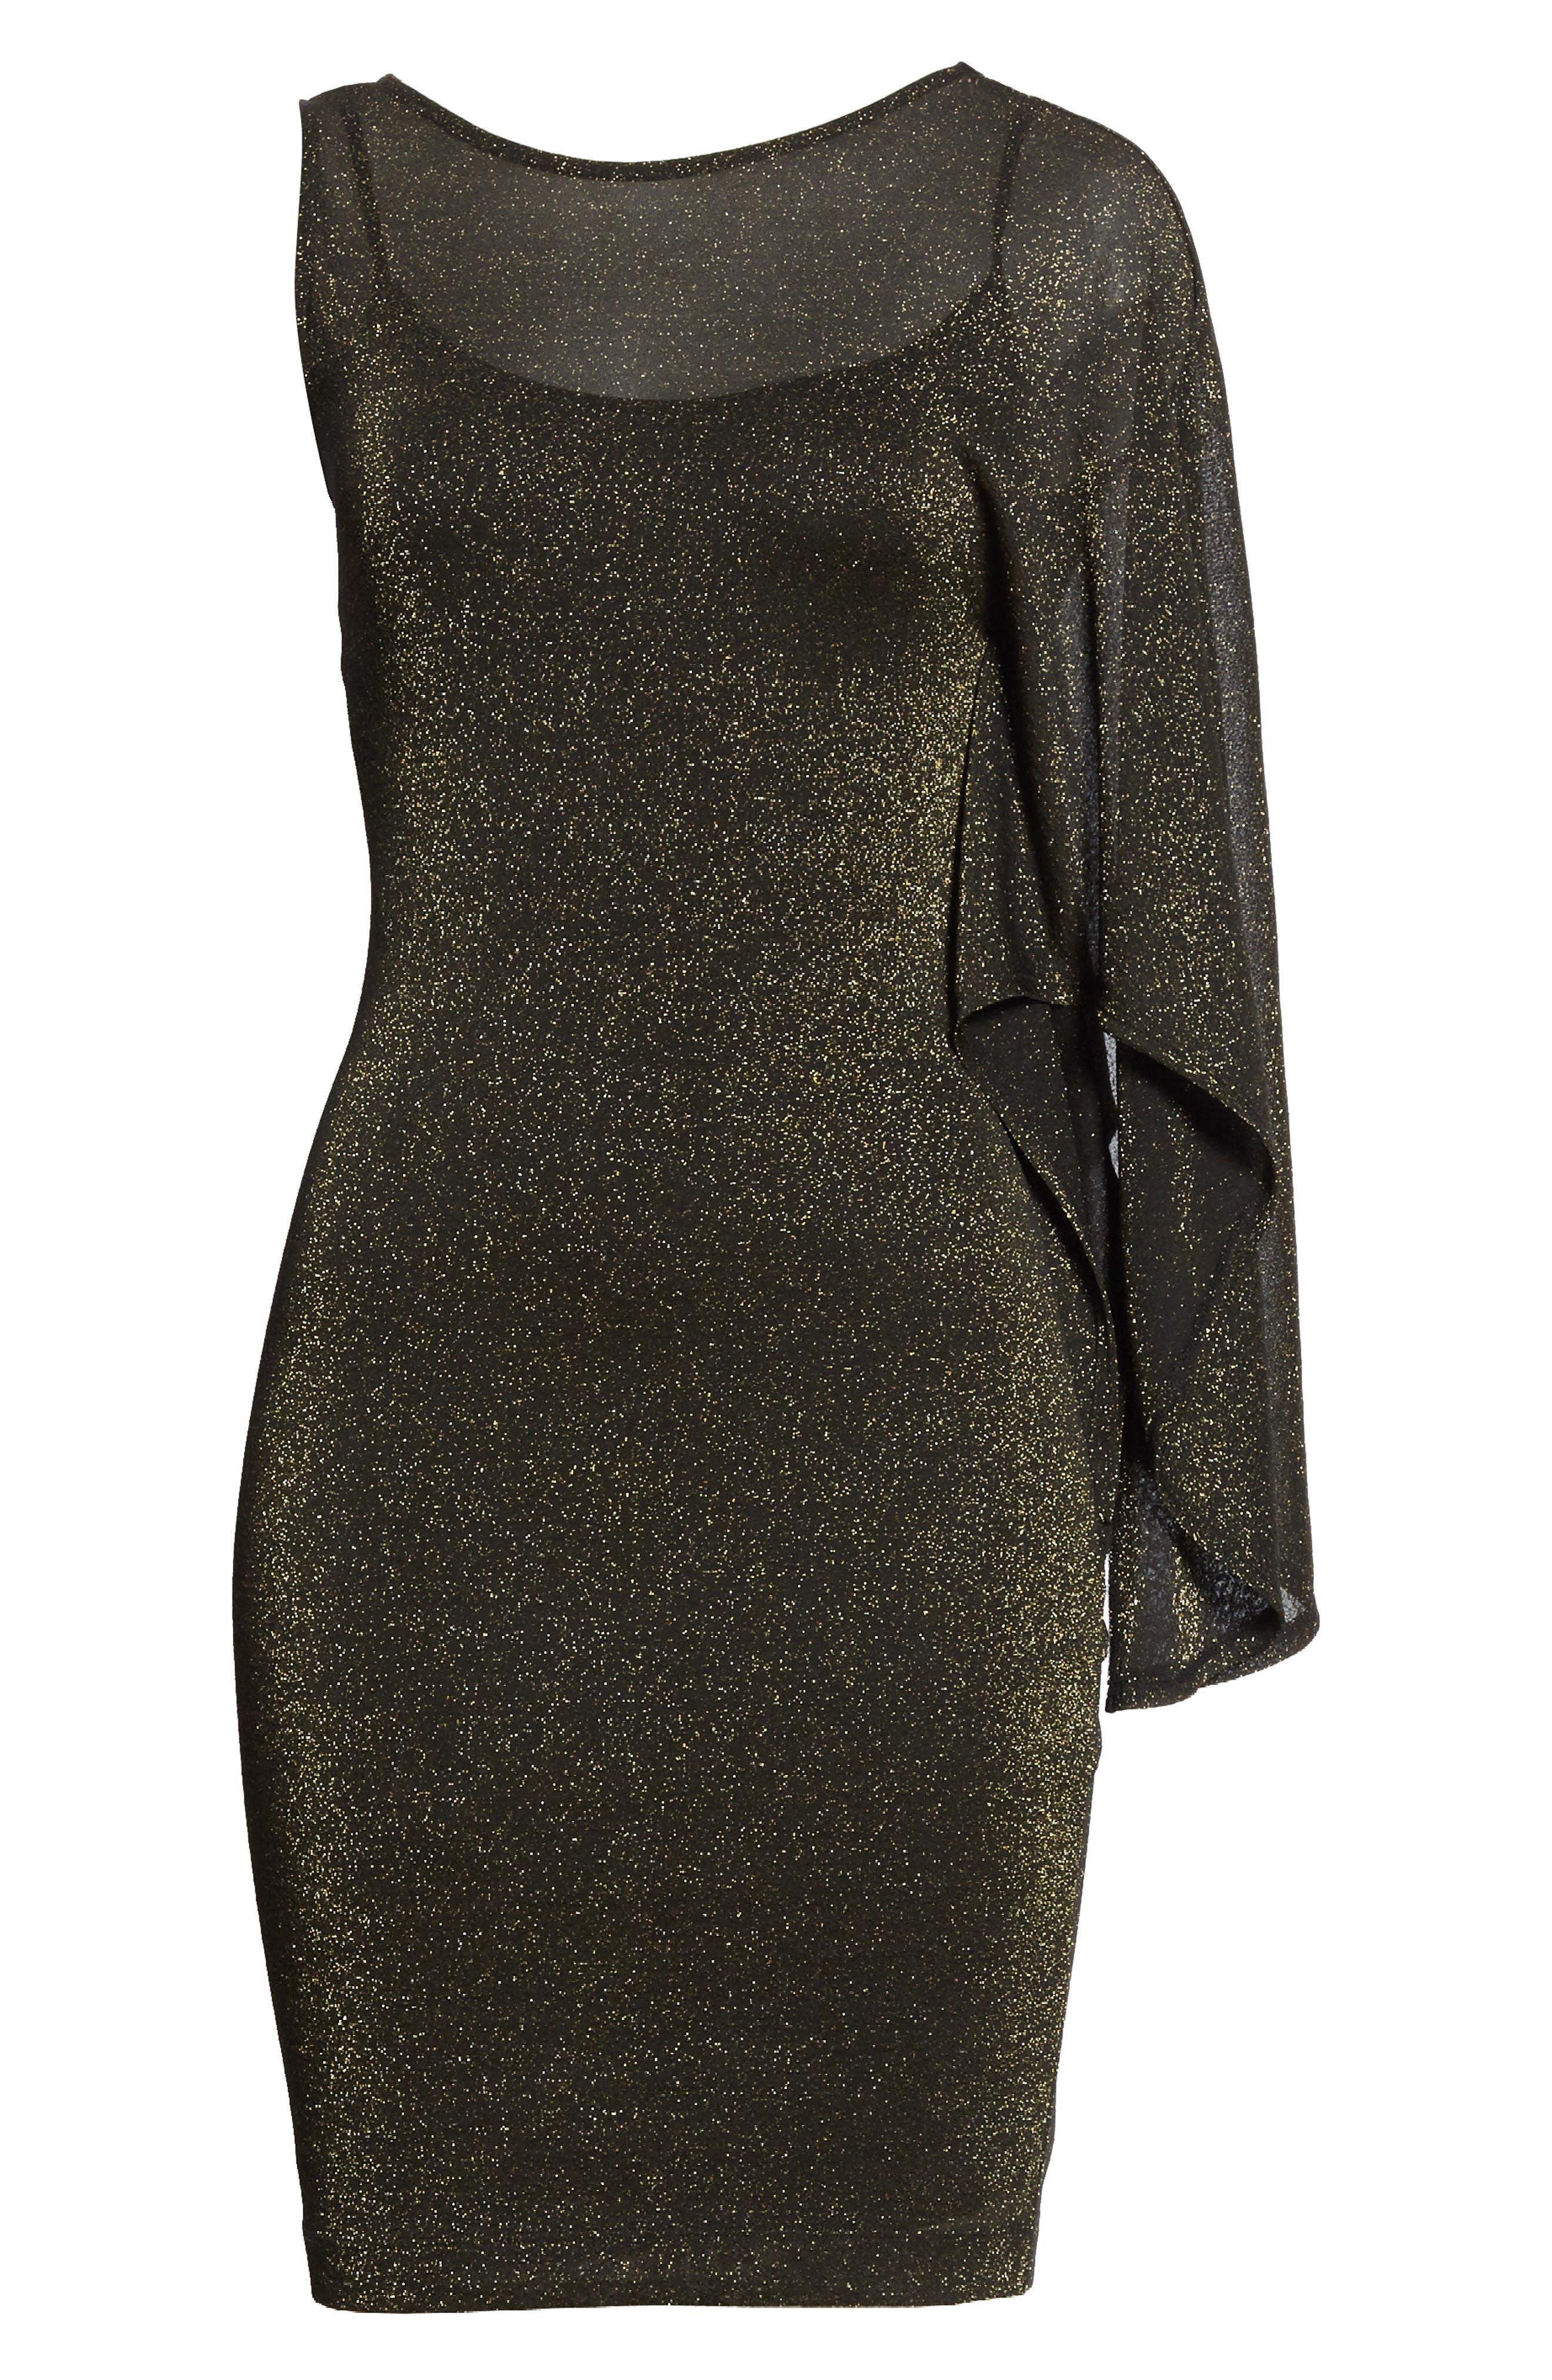 Draped One-Shoulder Dress,                             Alternate thumbnail 6, color,                             001